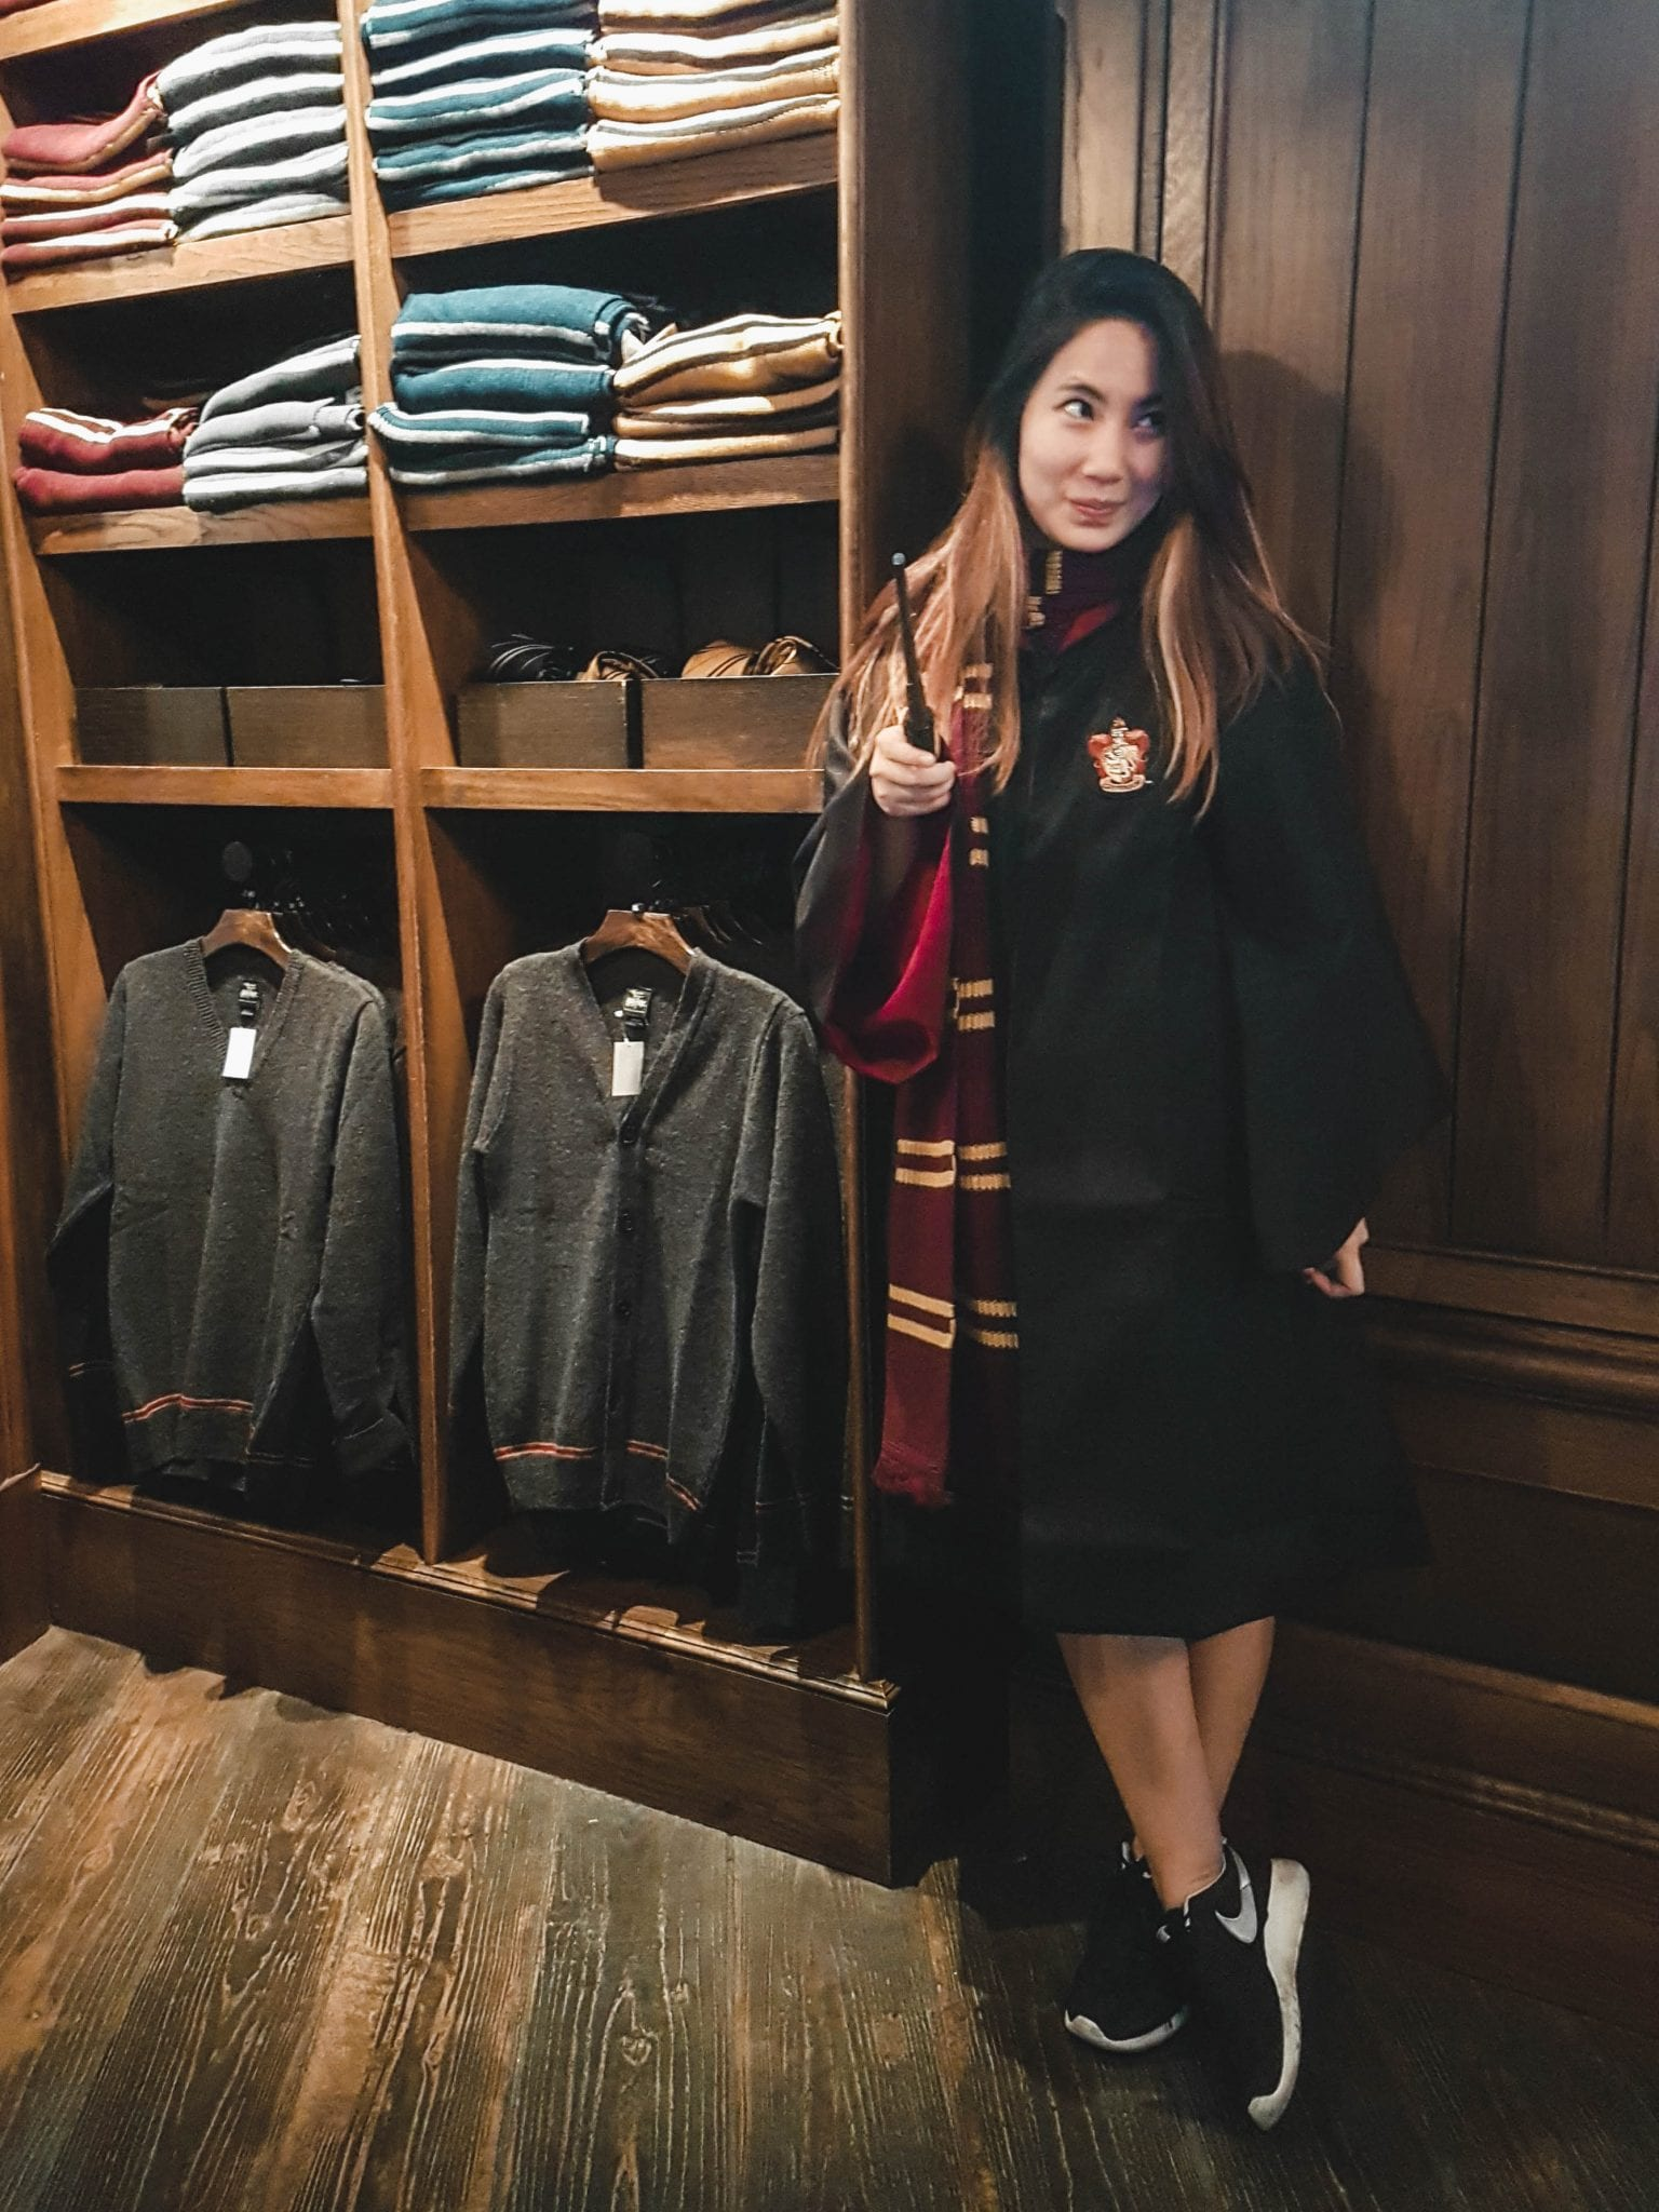 Wizarding World of Harry Potter - Gryffindor